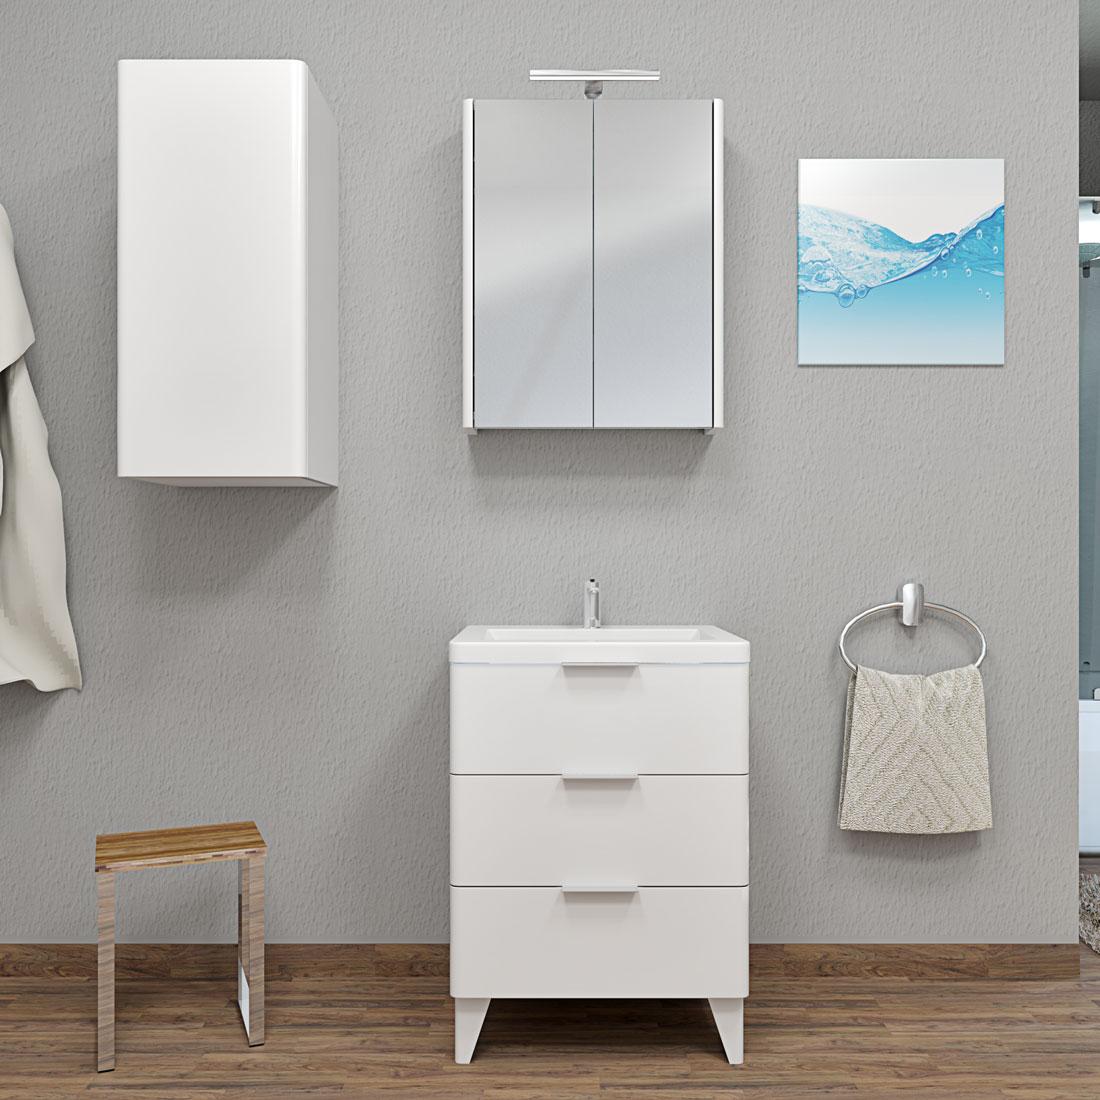 badm bel set curve 106 v2 mdf wei badezimmerm bel waschtisch 60cm. Black Bedroom Furniture Sets. Home Design Ideas